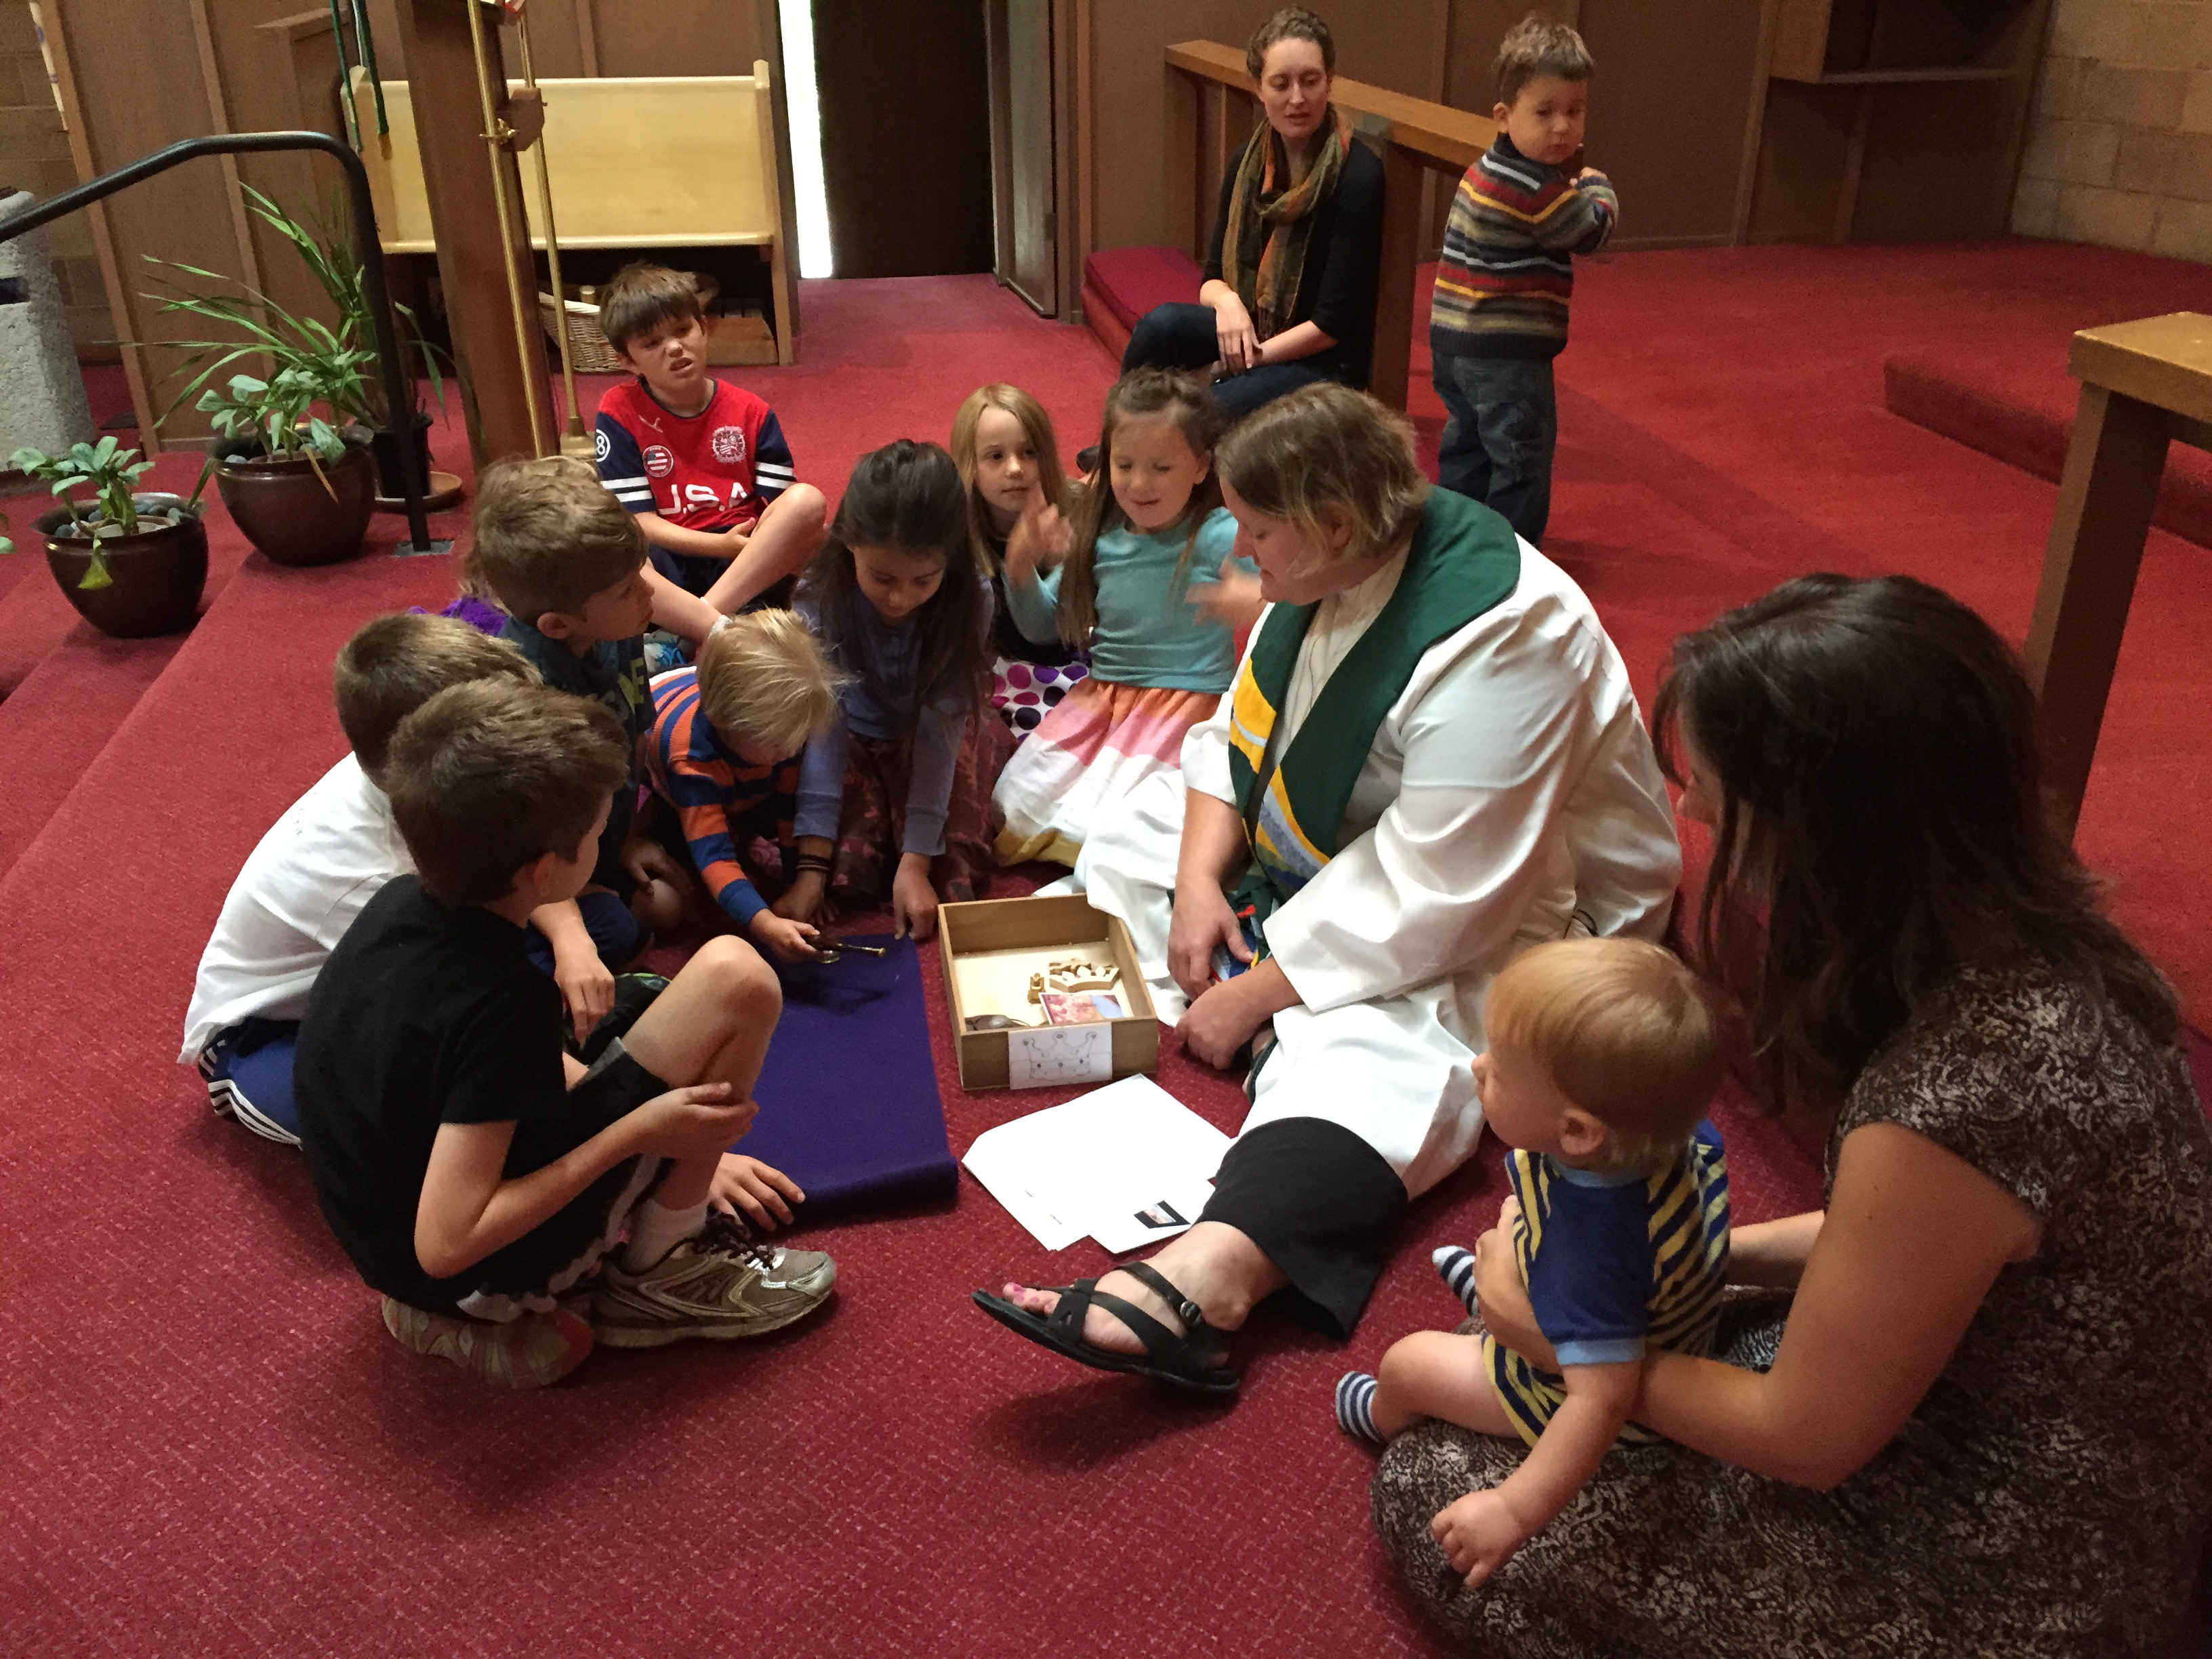 2015-07-26 Last Sunday Children 3.JPG